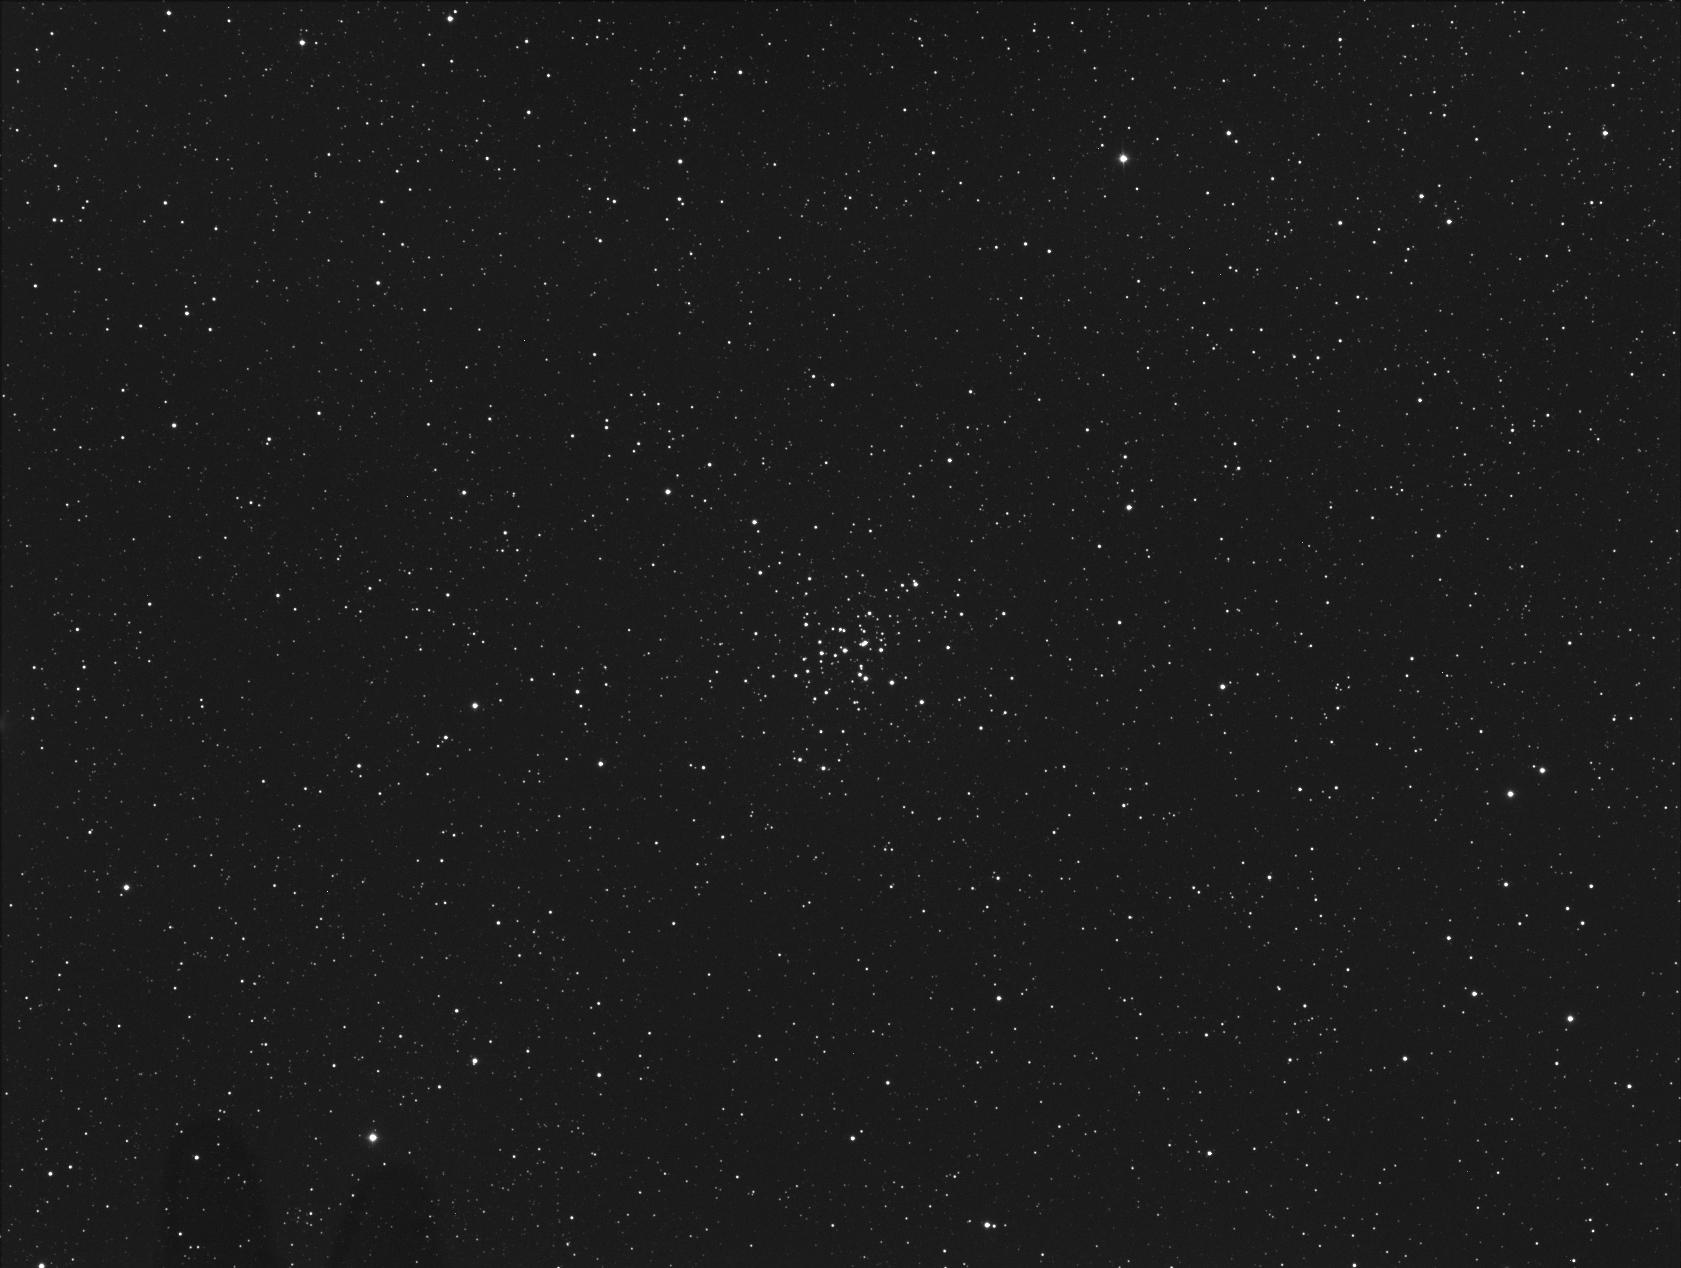 140928 M36_120_ABE - Pose unitaire Atik 383L+ sur FSQ106